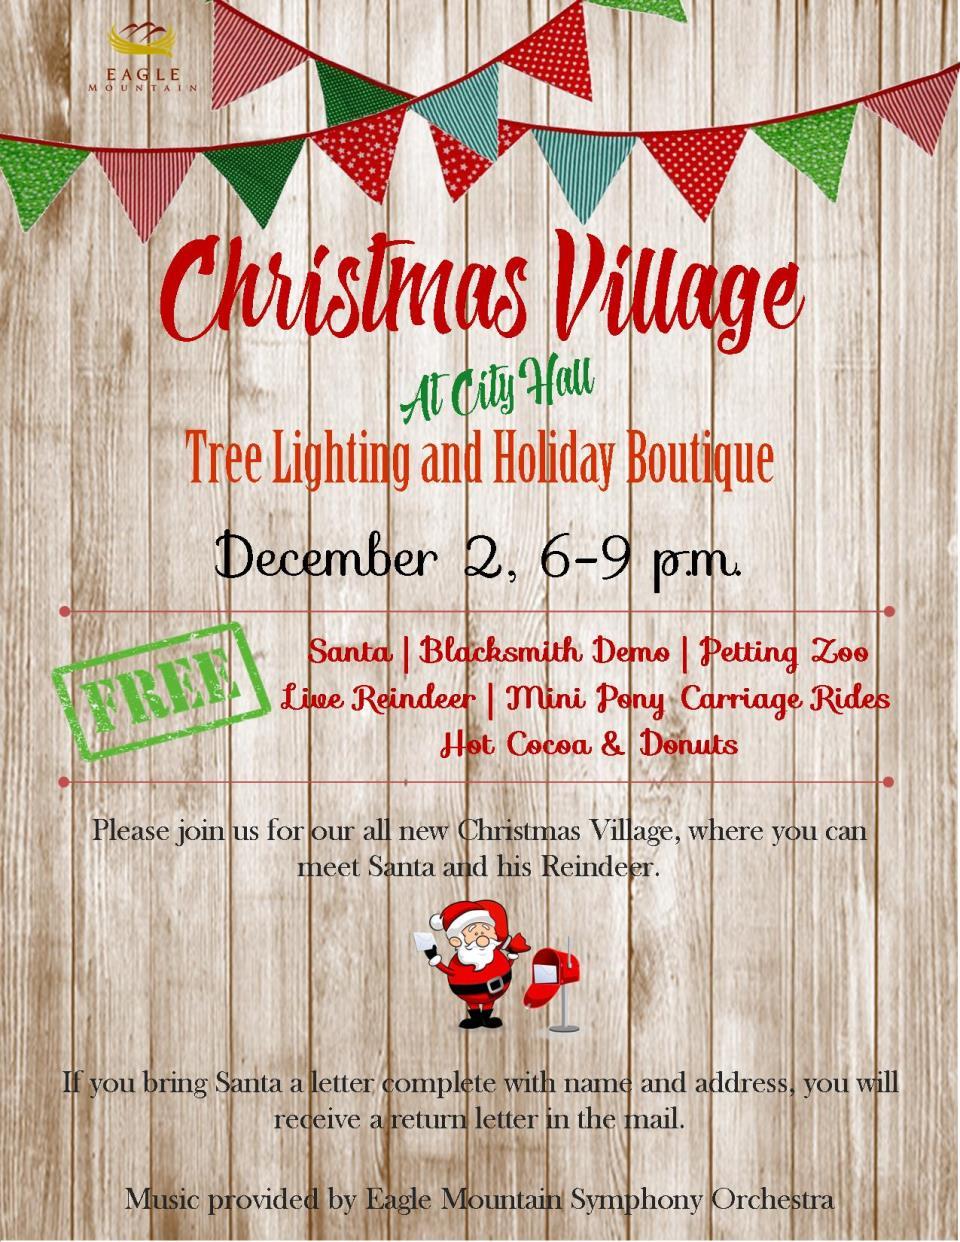 Eagle Mountain Christmas Village presented by Eagle Mountain City ...